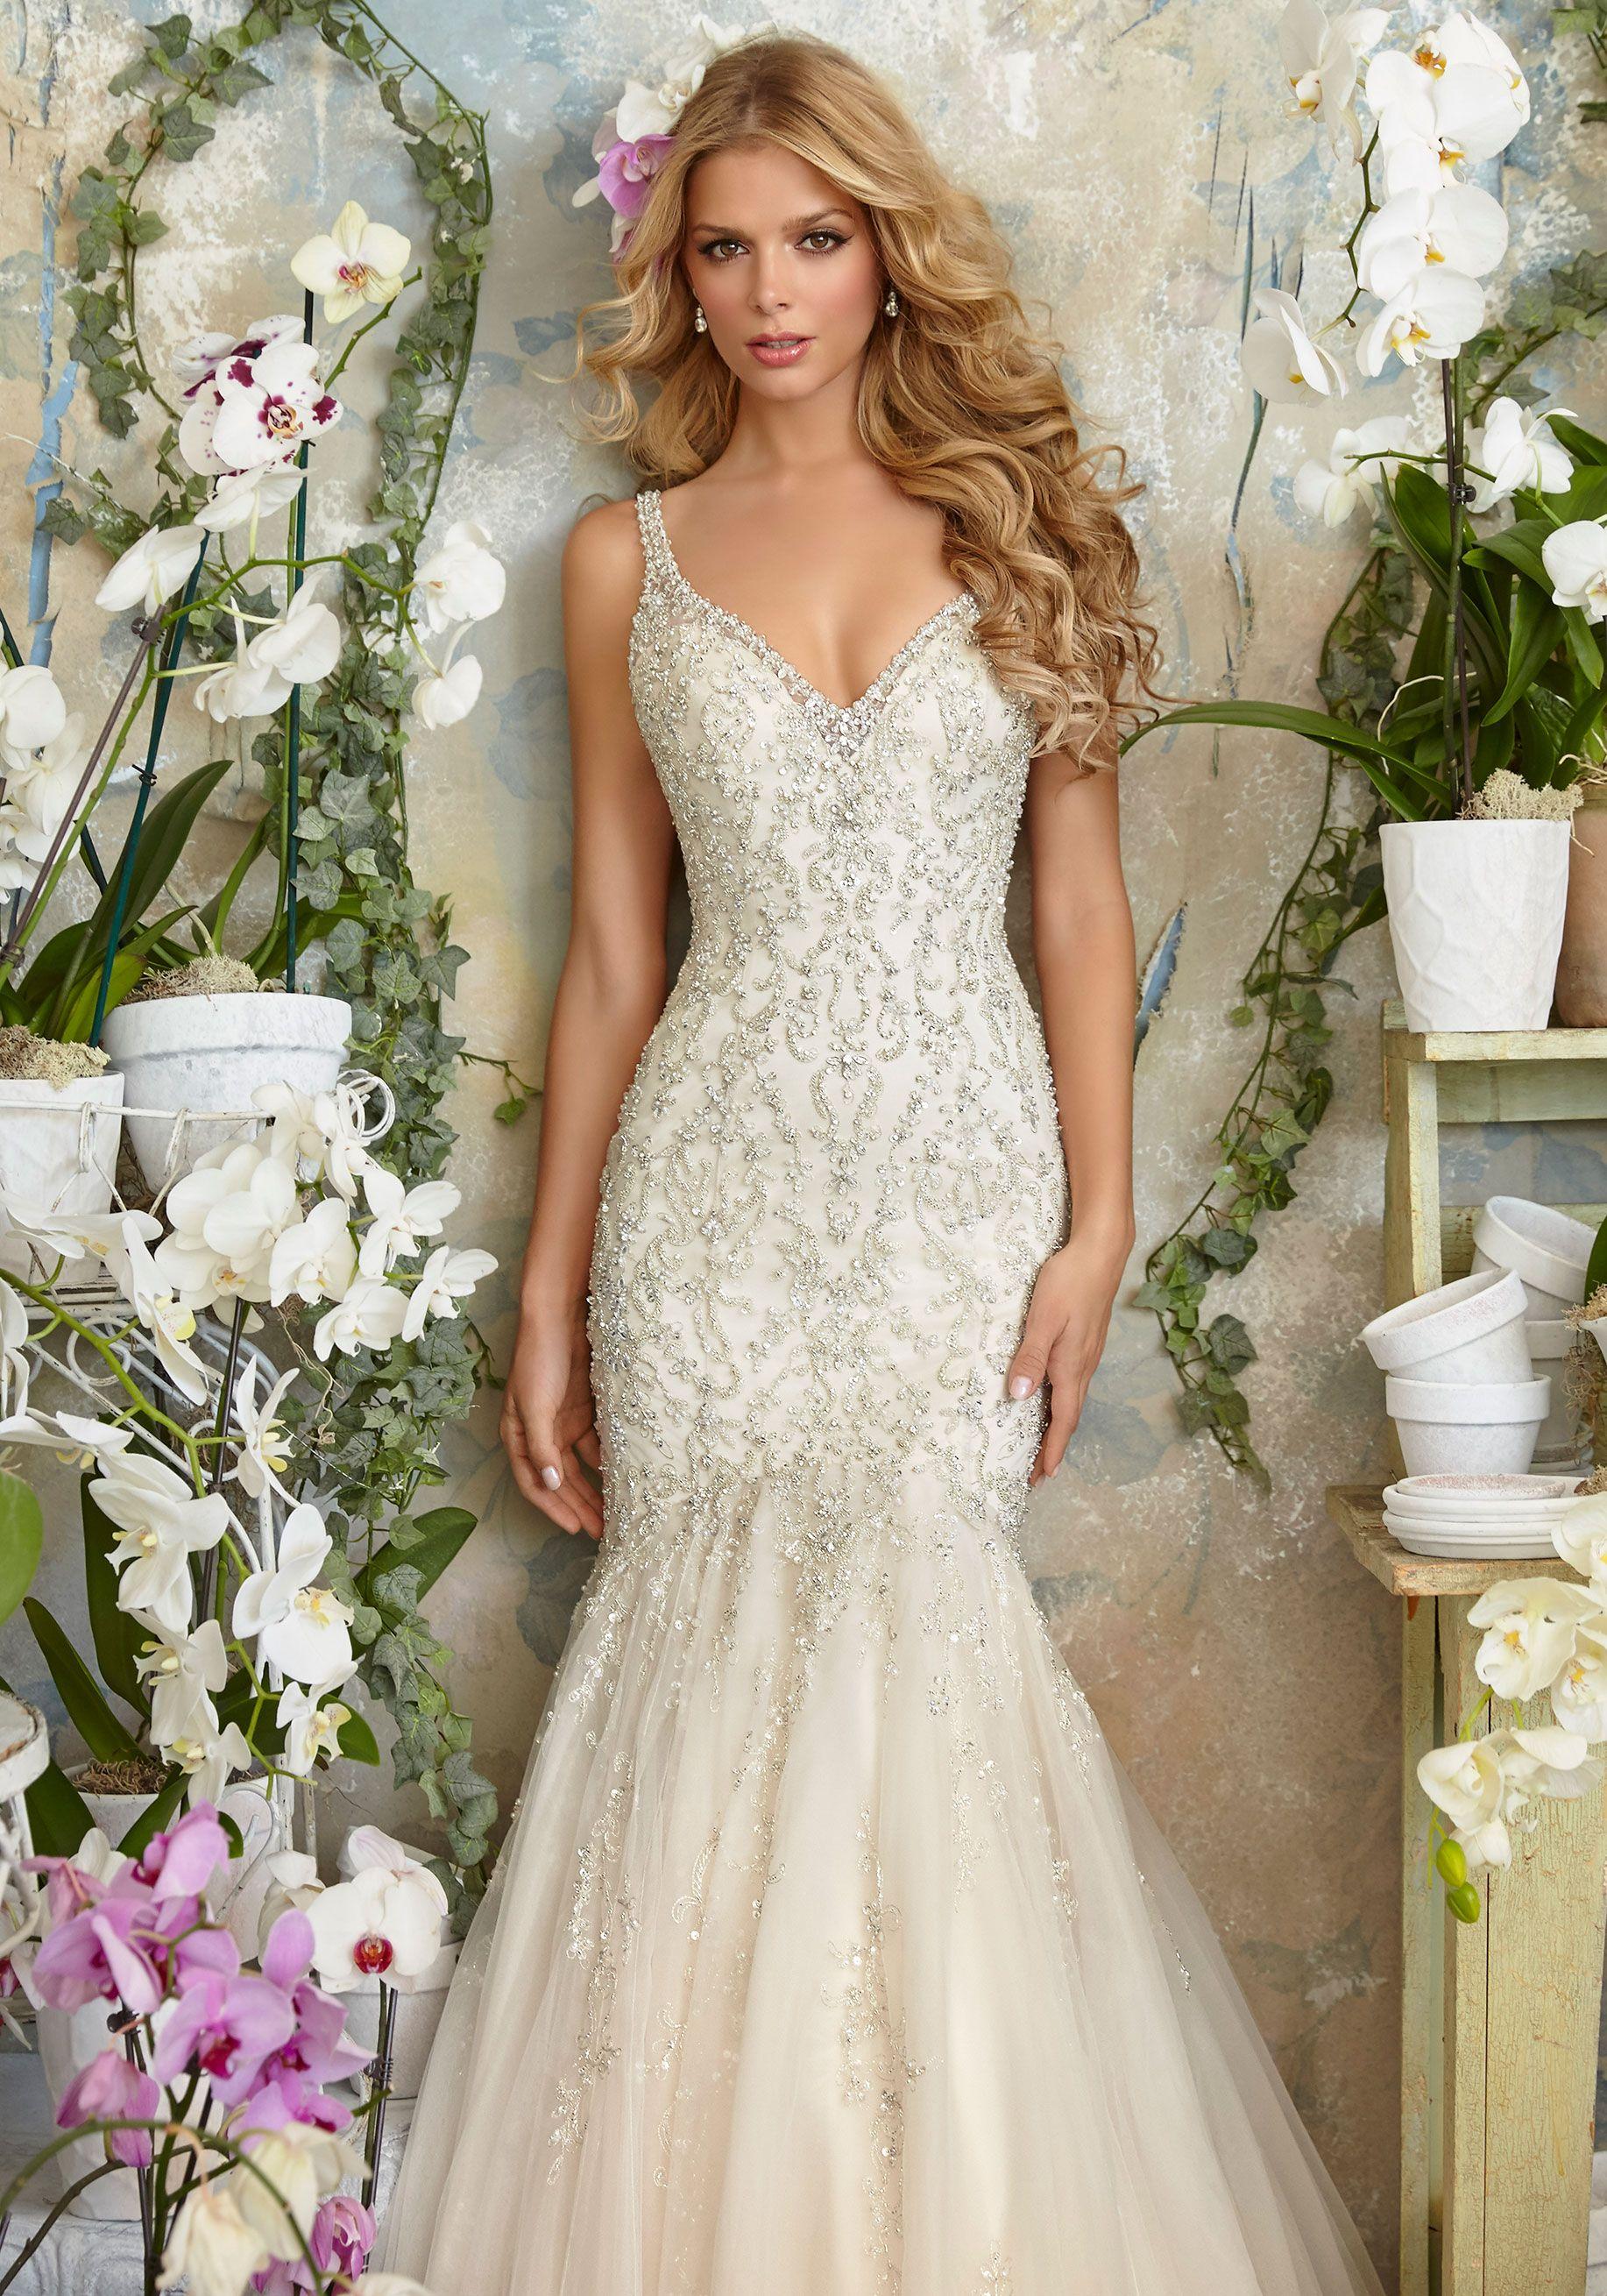 Mama june wedding dress  Kerice Simms kiki on Pinterest